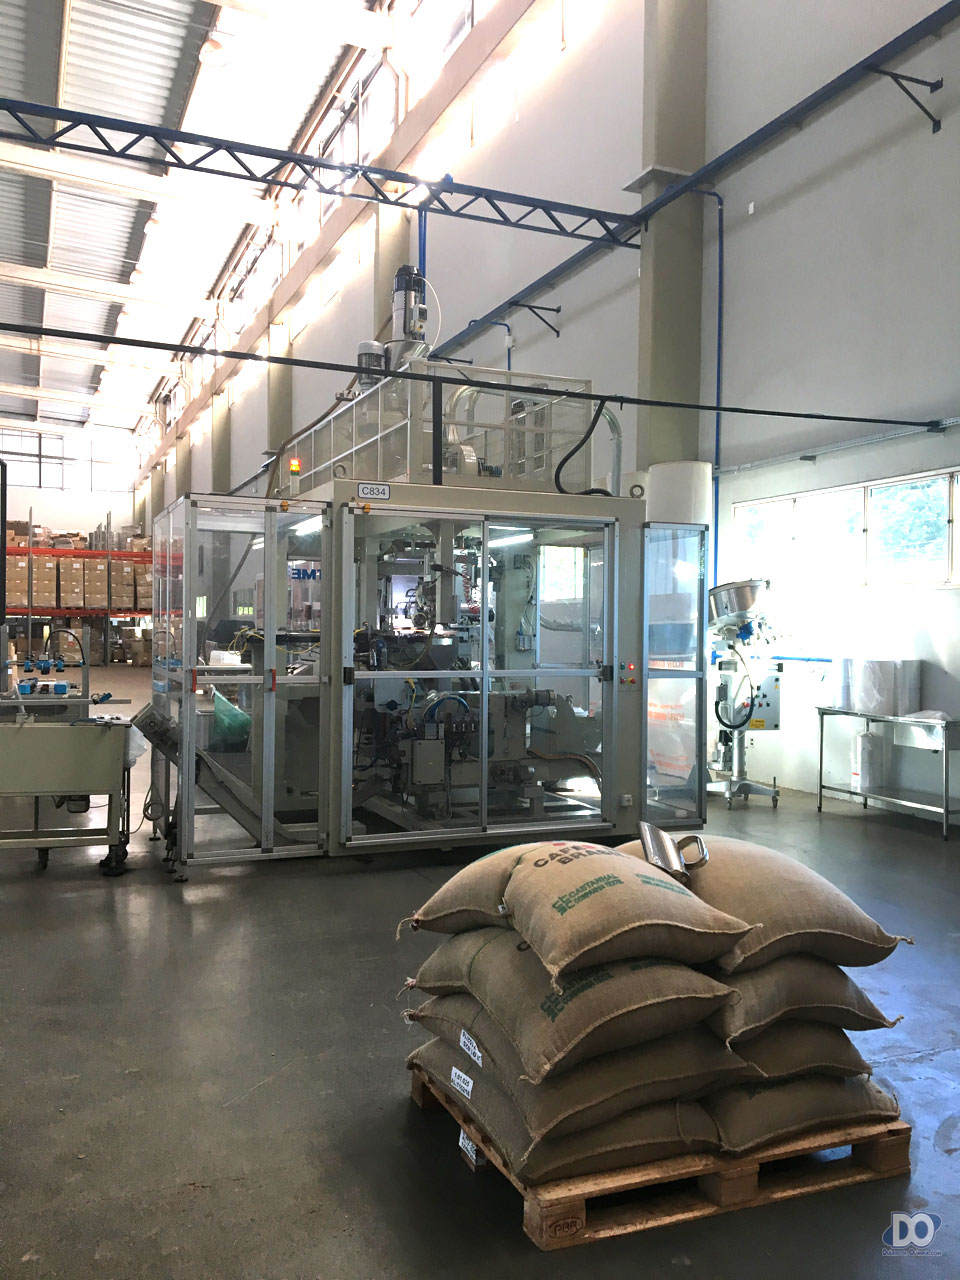 Unidade Industrial Kaffa Brasil